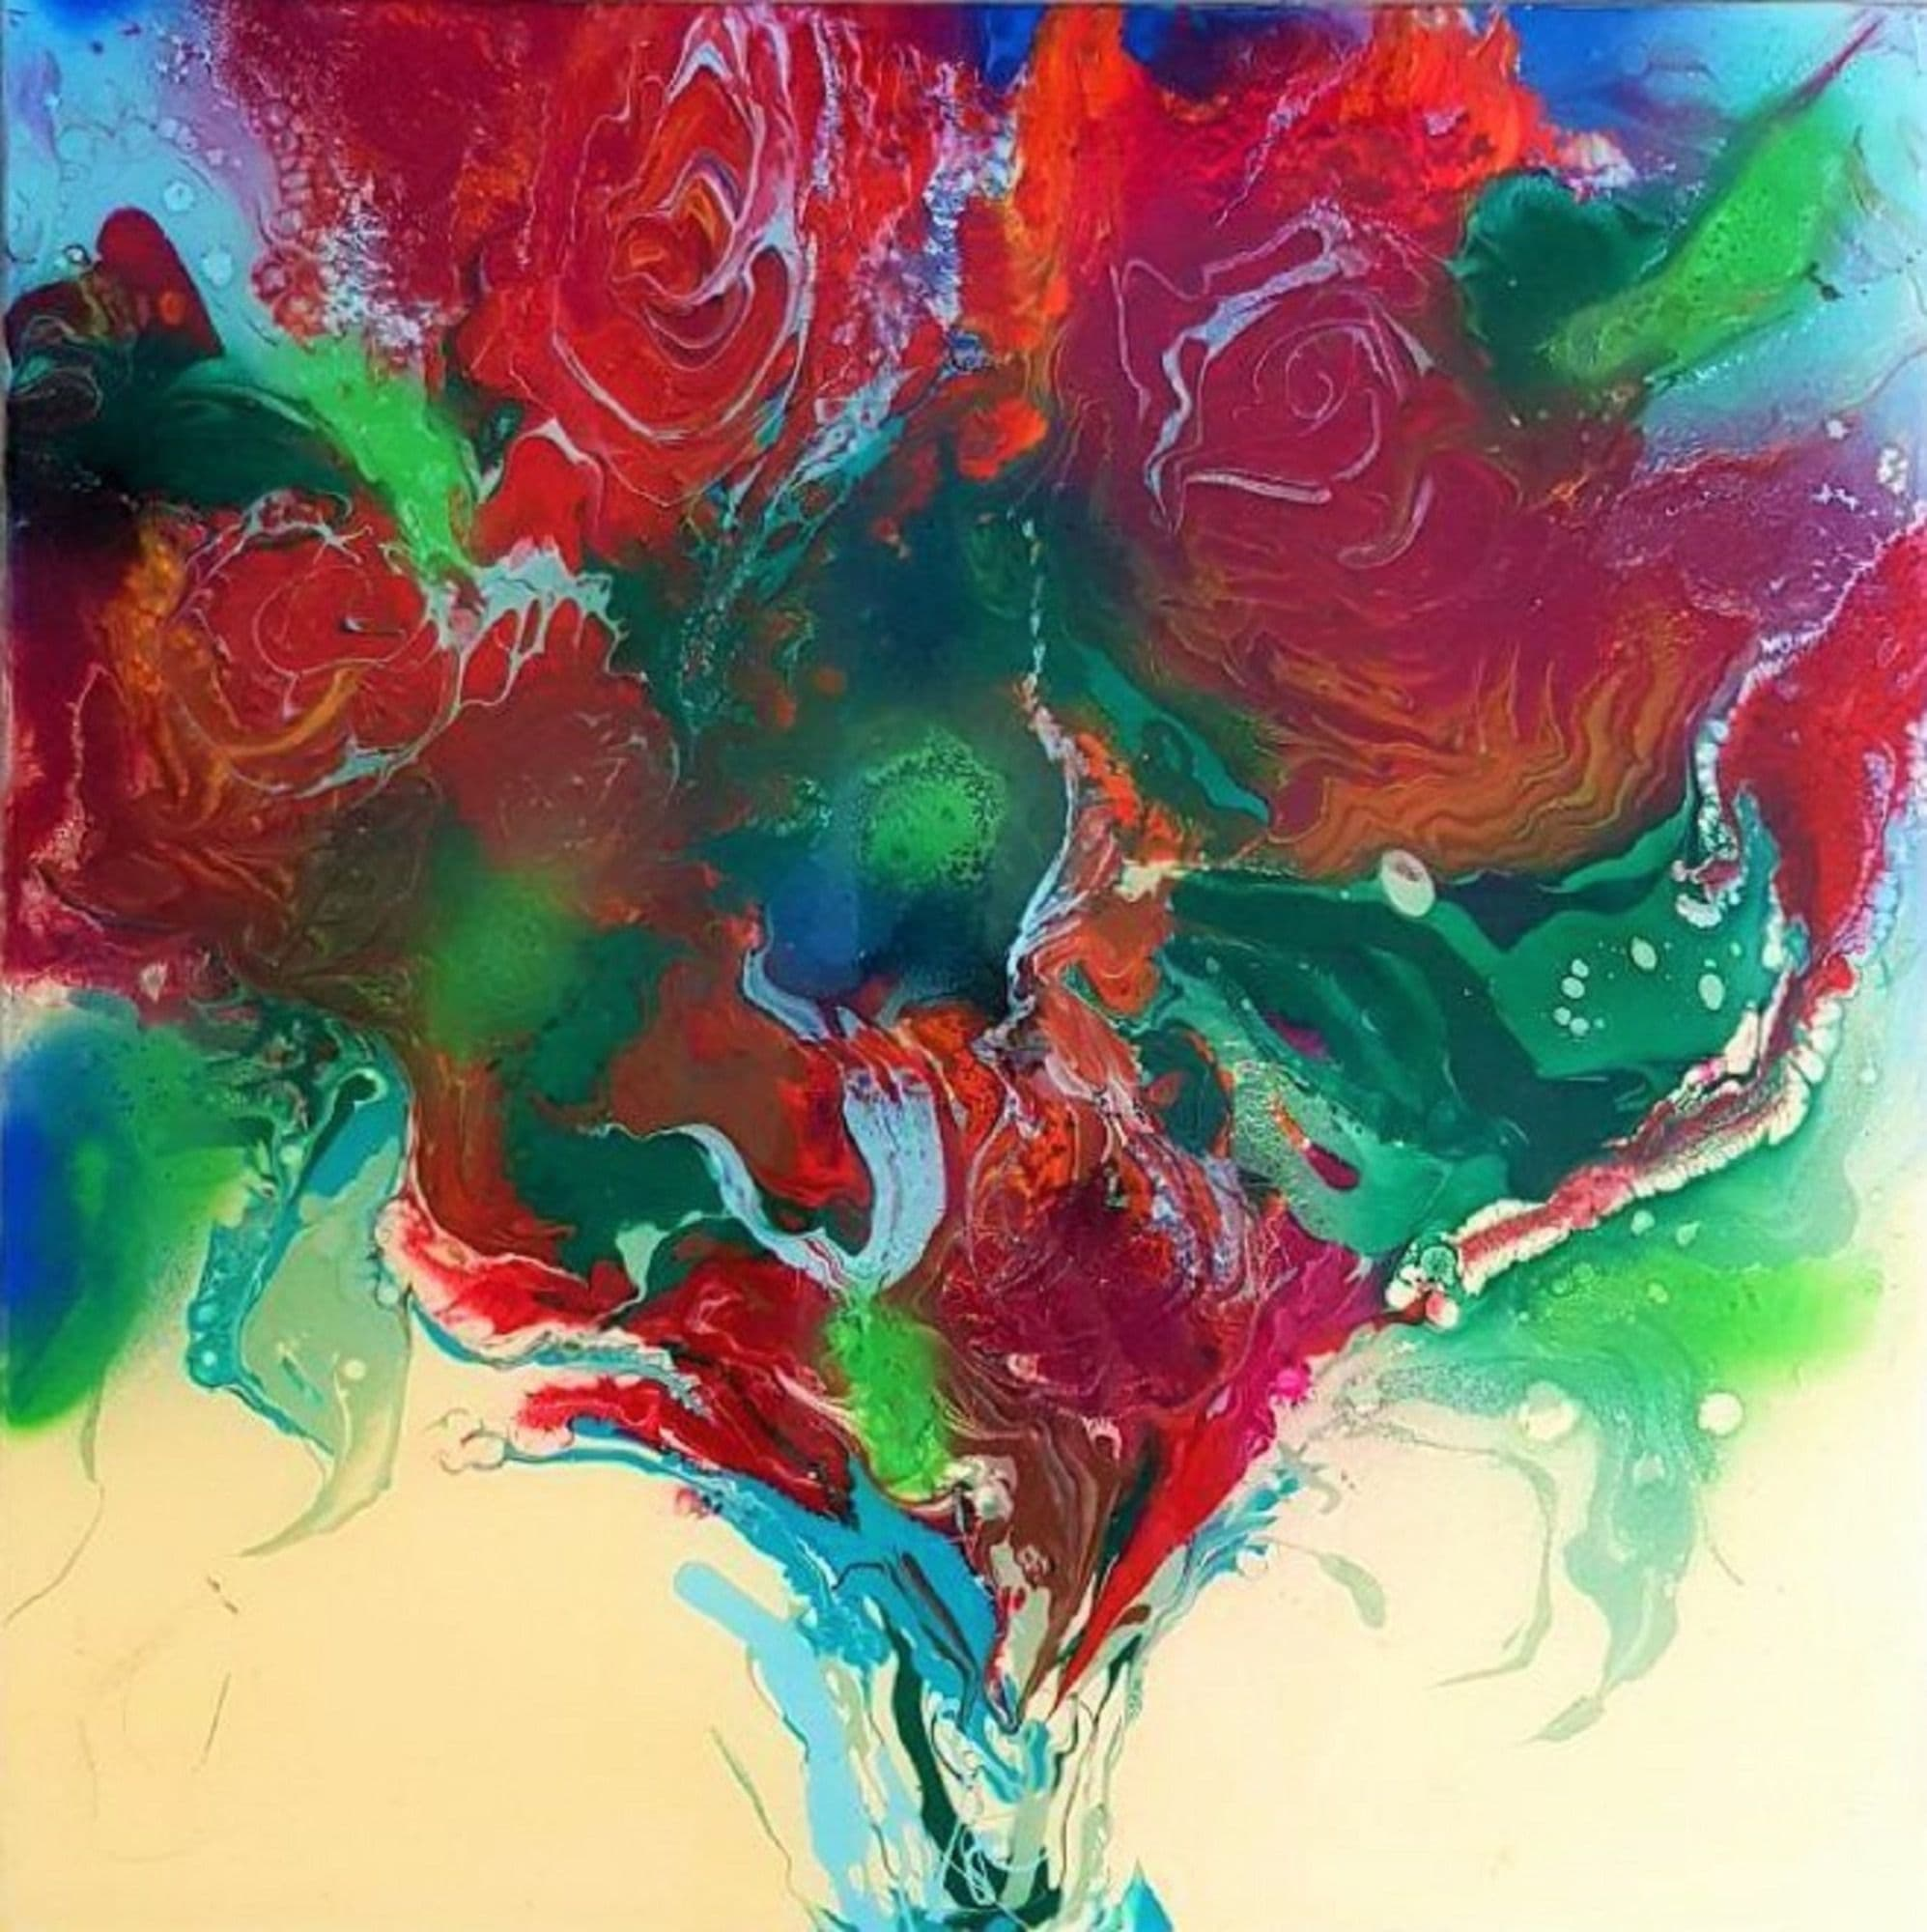 Roses - 1/4